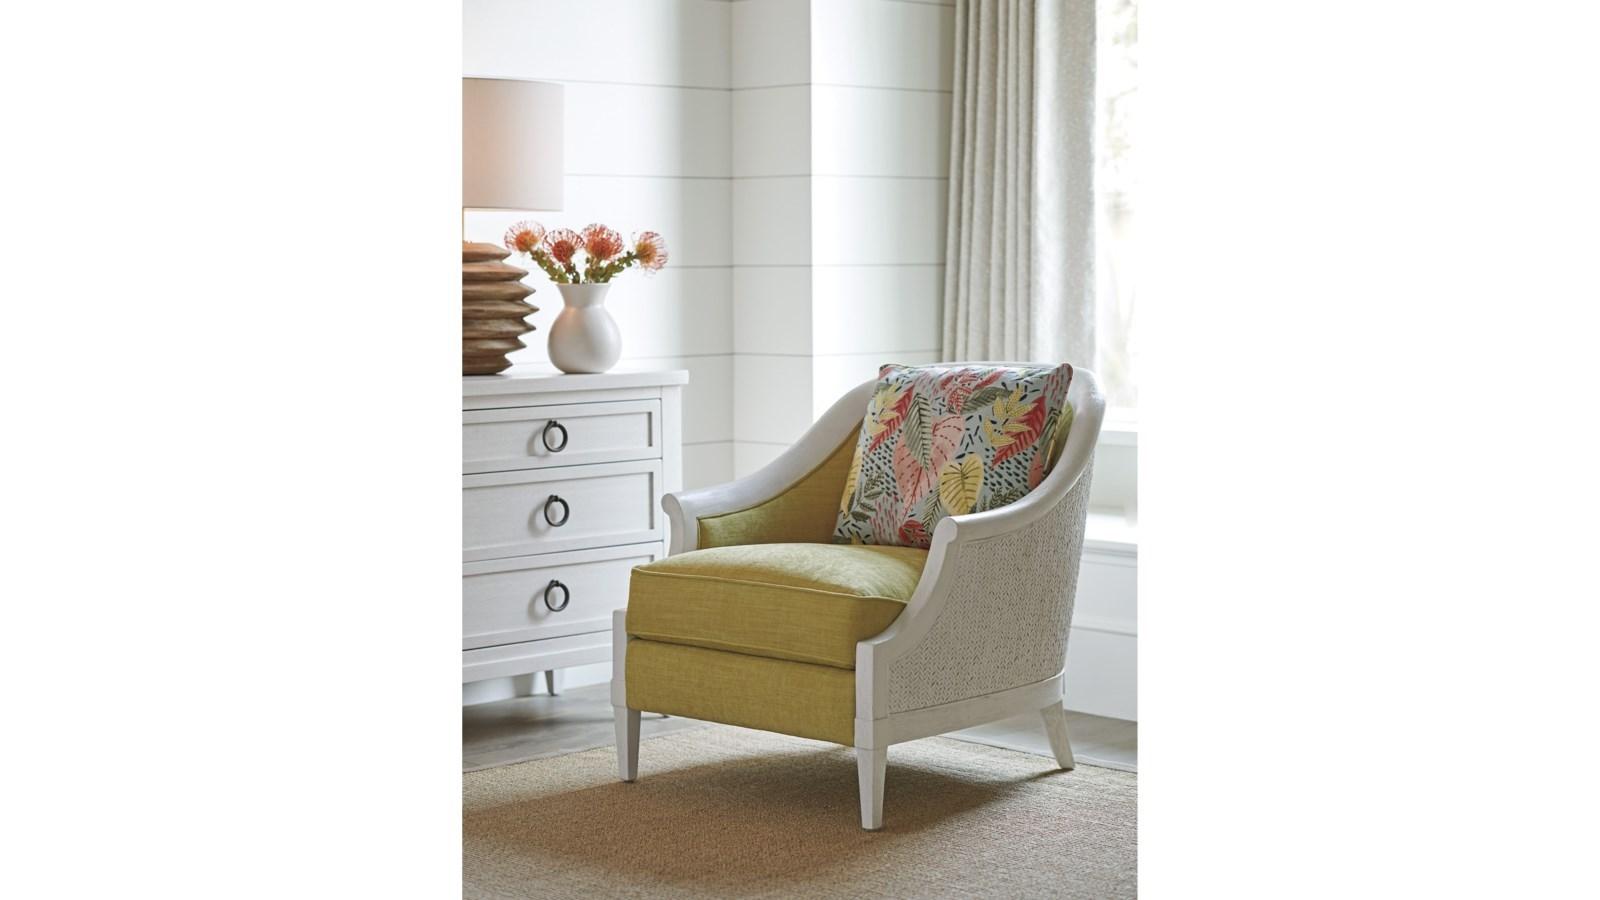 Ocean Breeze Westbank Upholstered Wicker Chair